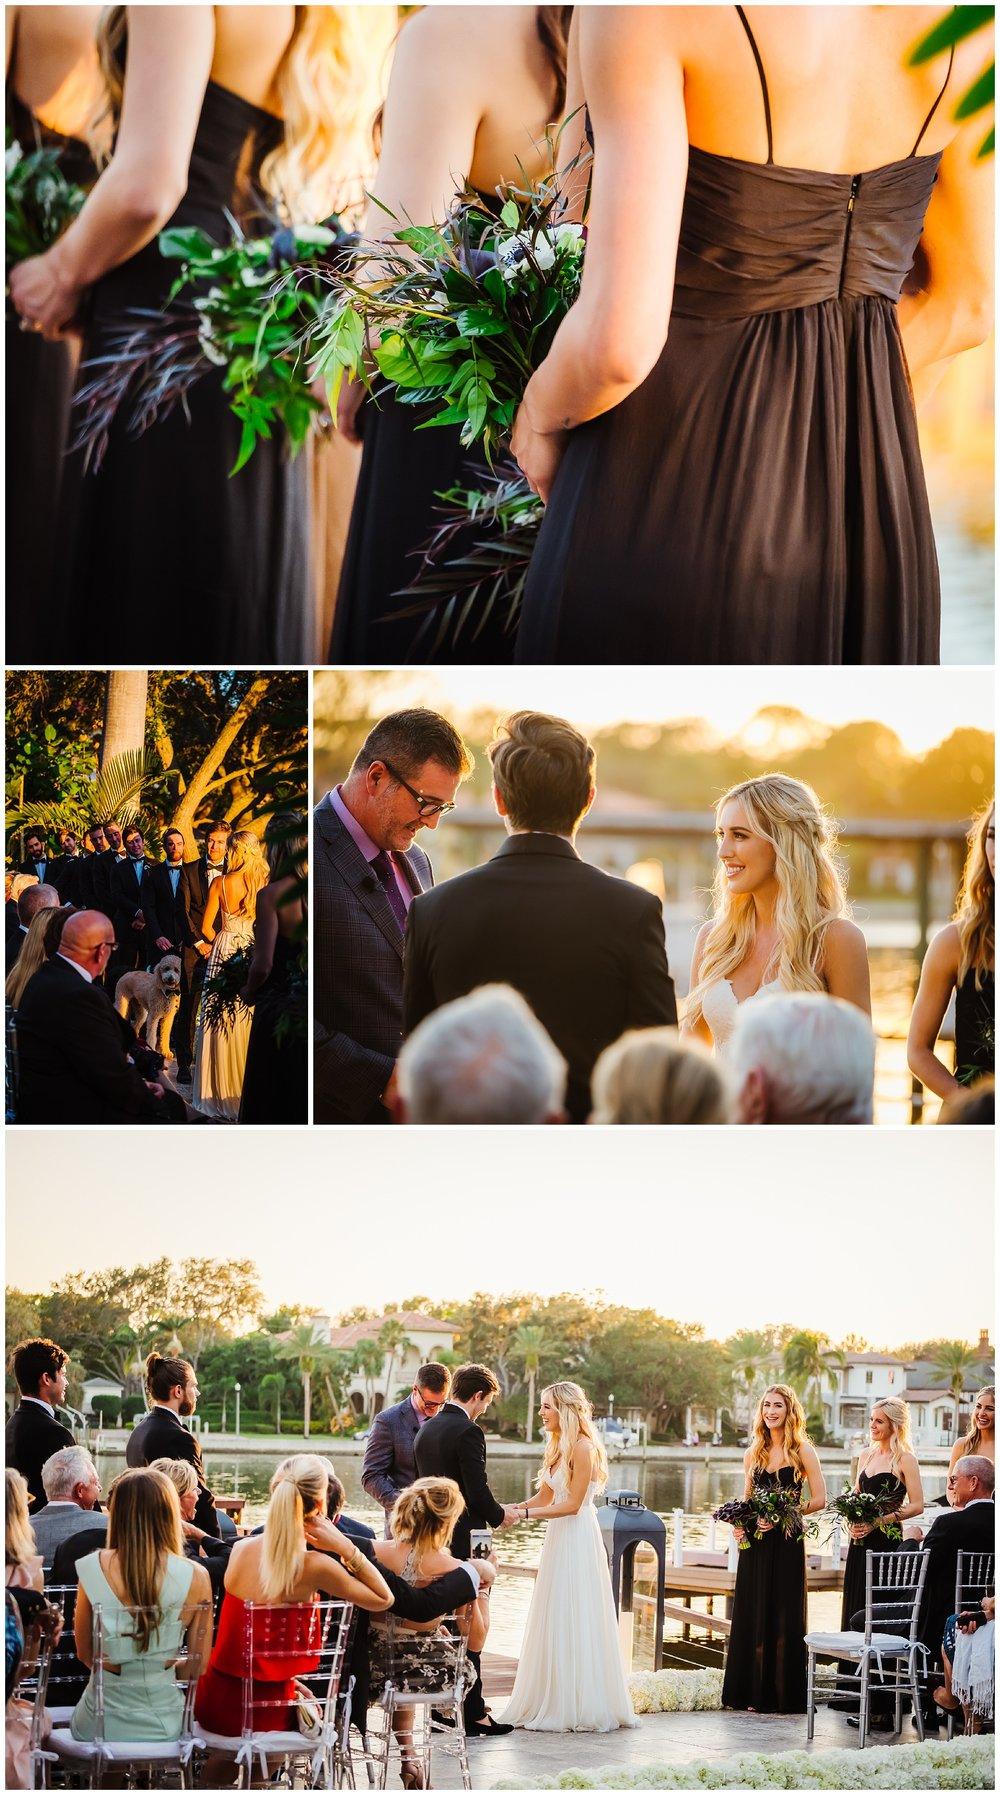 st-pete-wedding-photographer-backyard-luxury-snell-isle-vinoy_0040.jpg